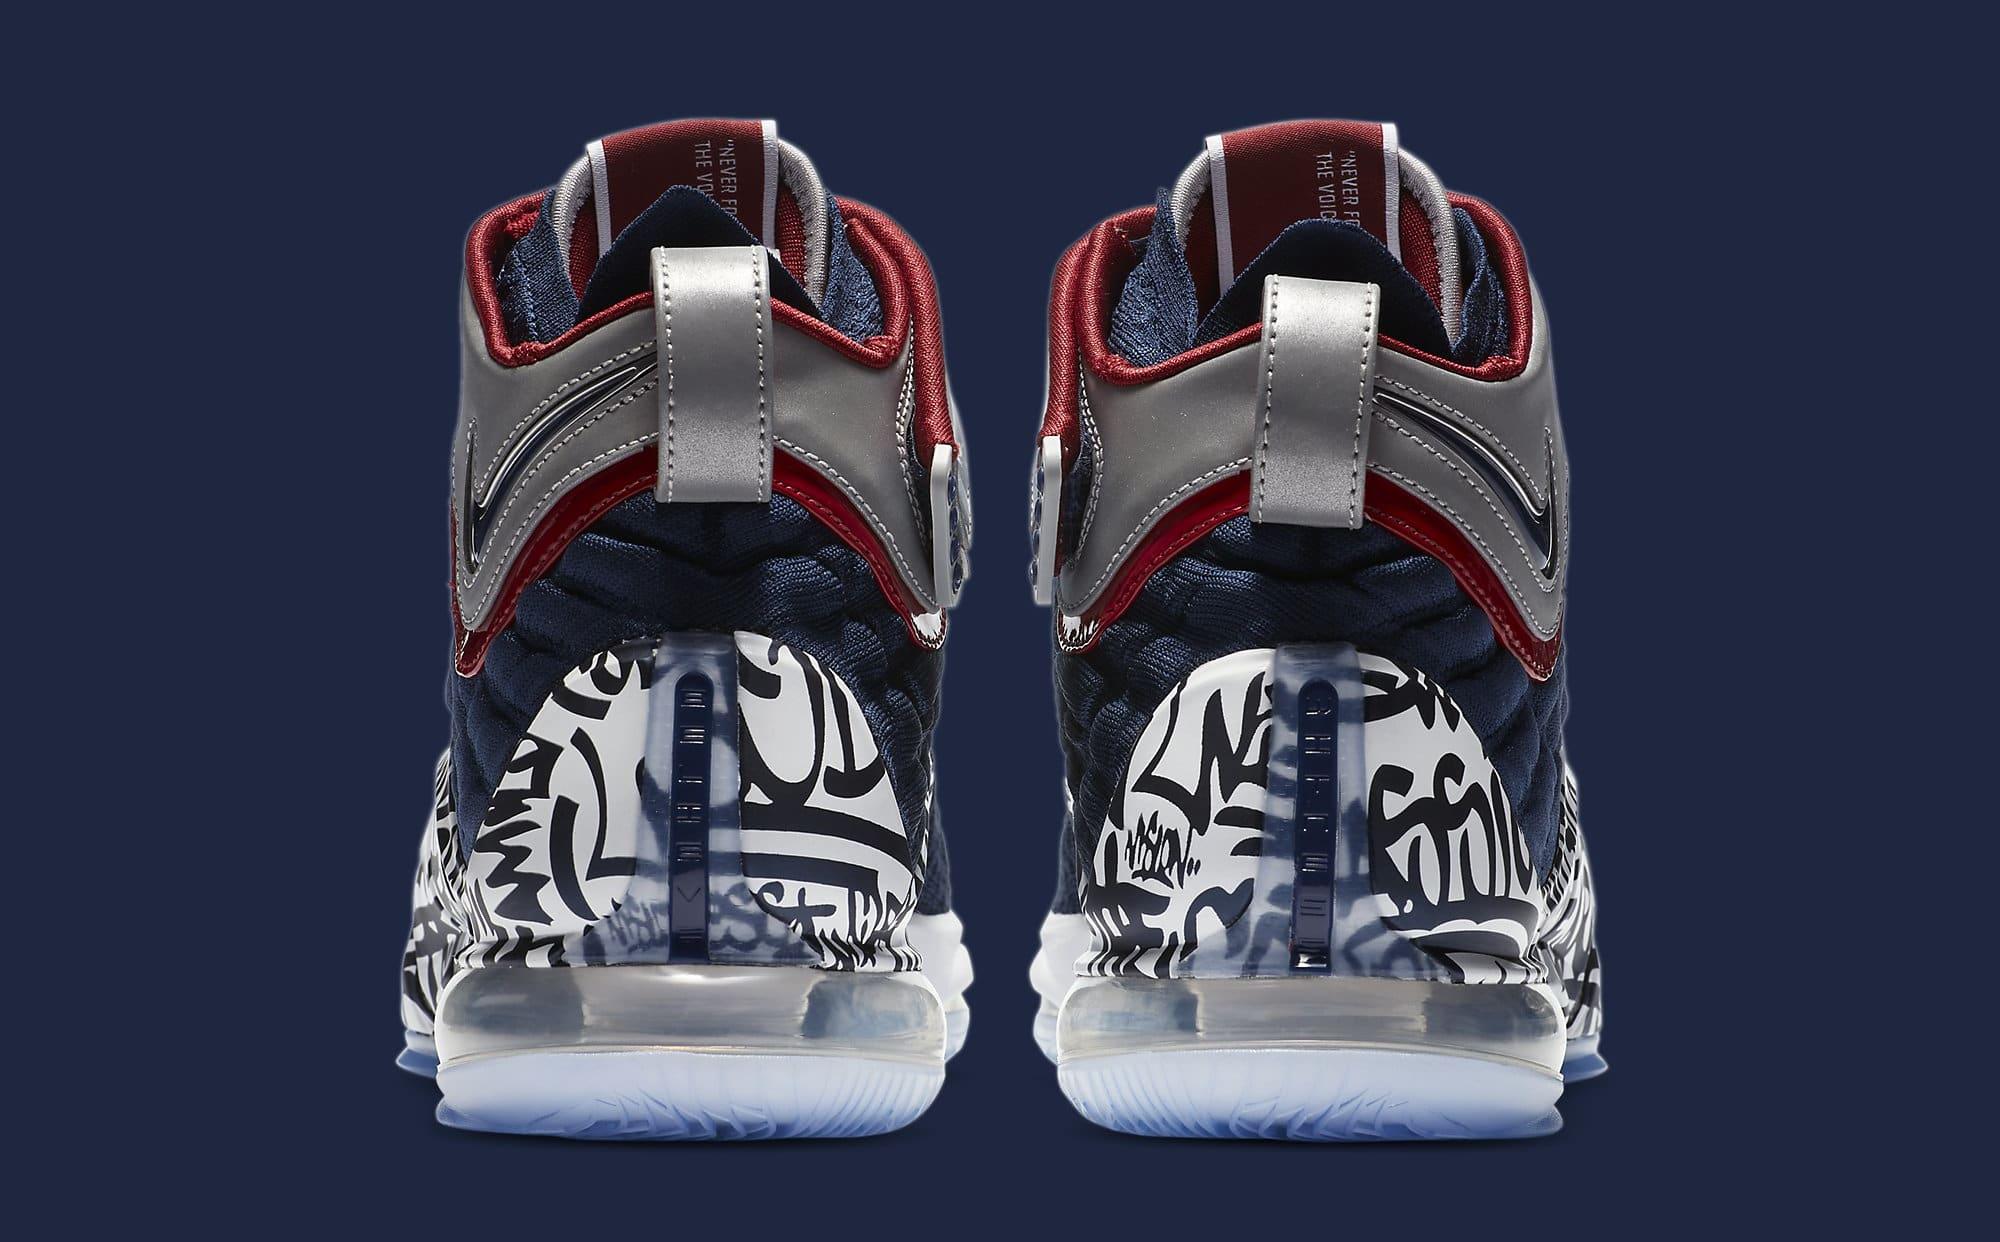 Nike LeBron 17 'All-Star Graffiti' CT6047-400 Heel